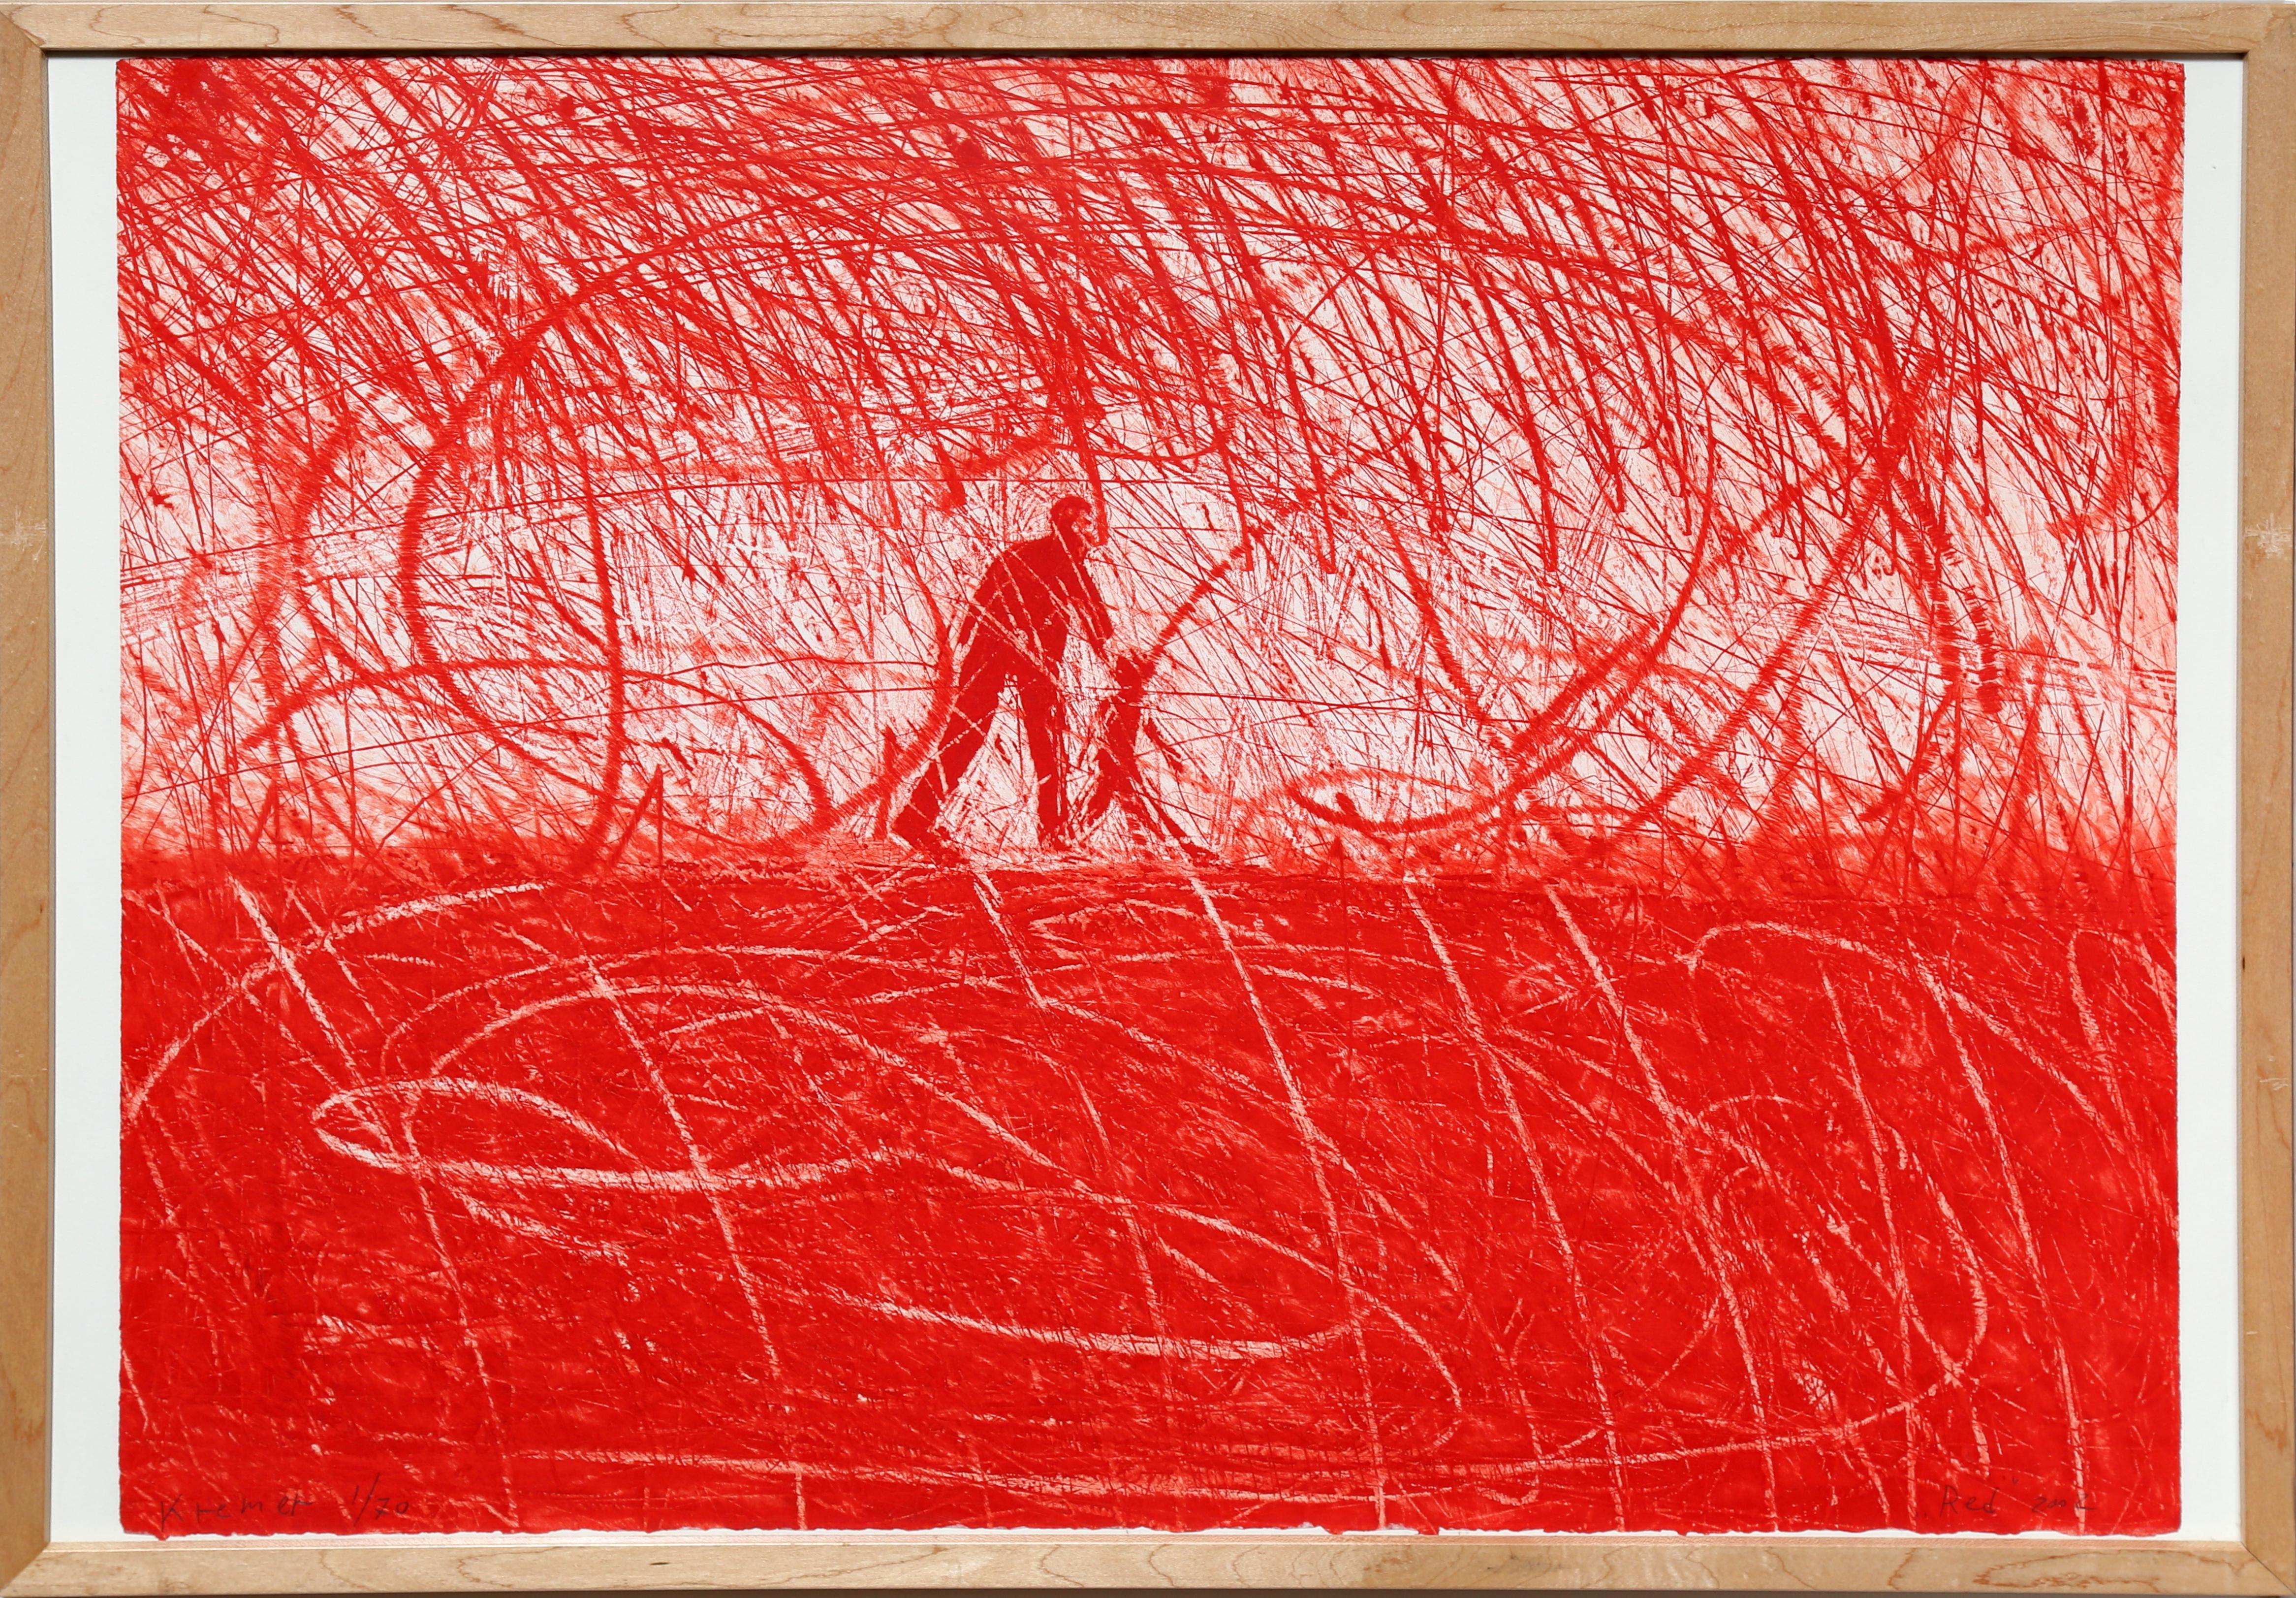 Red Man in Landscape